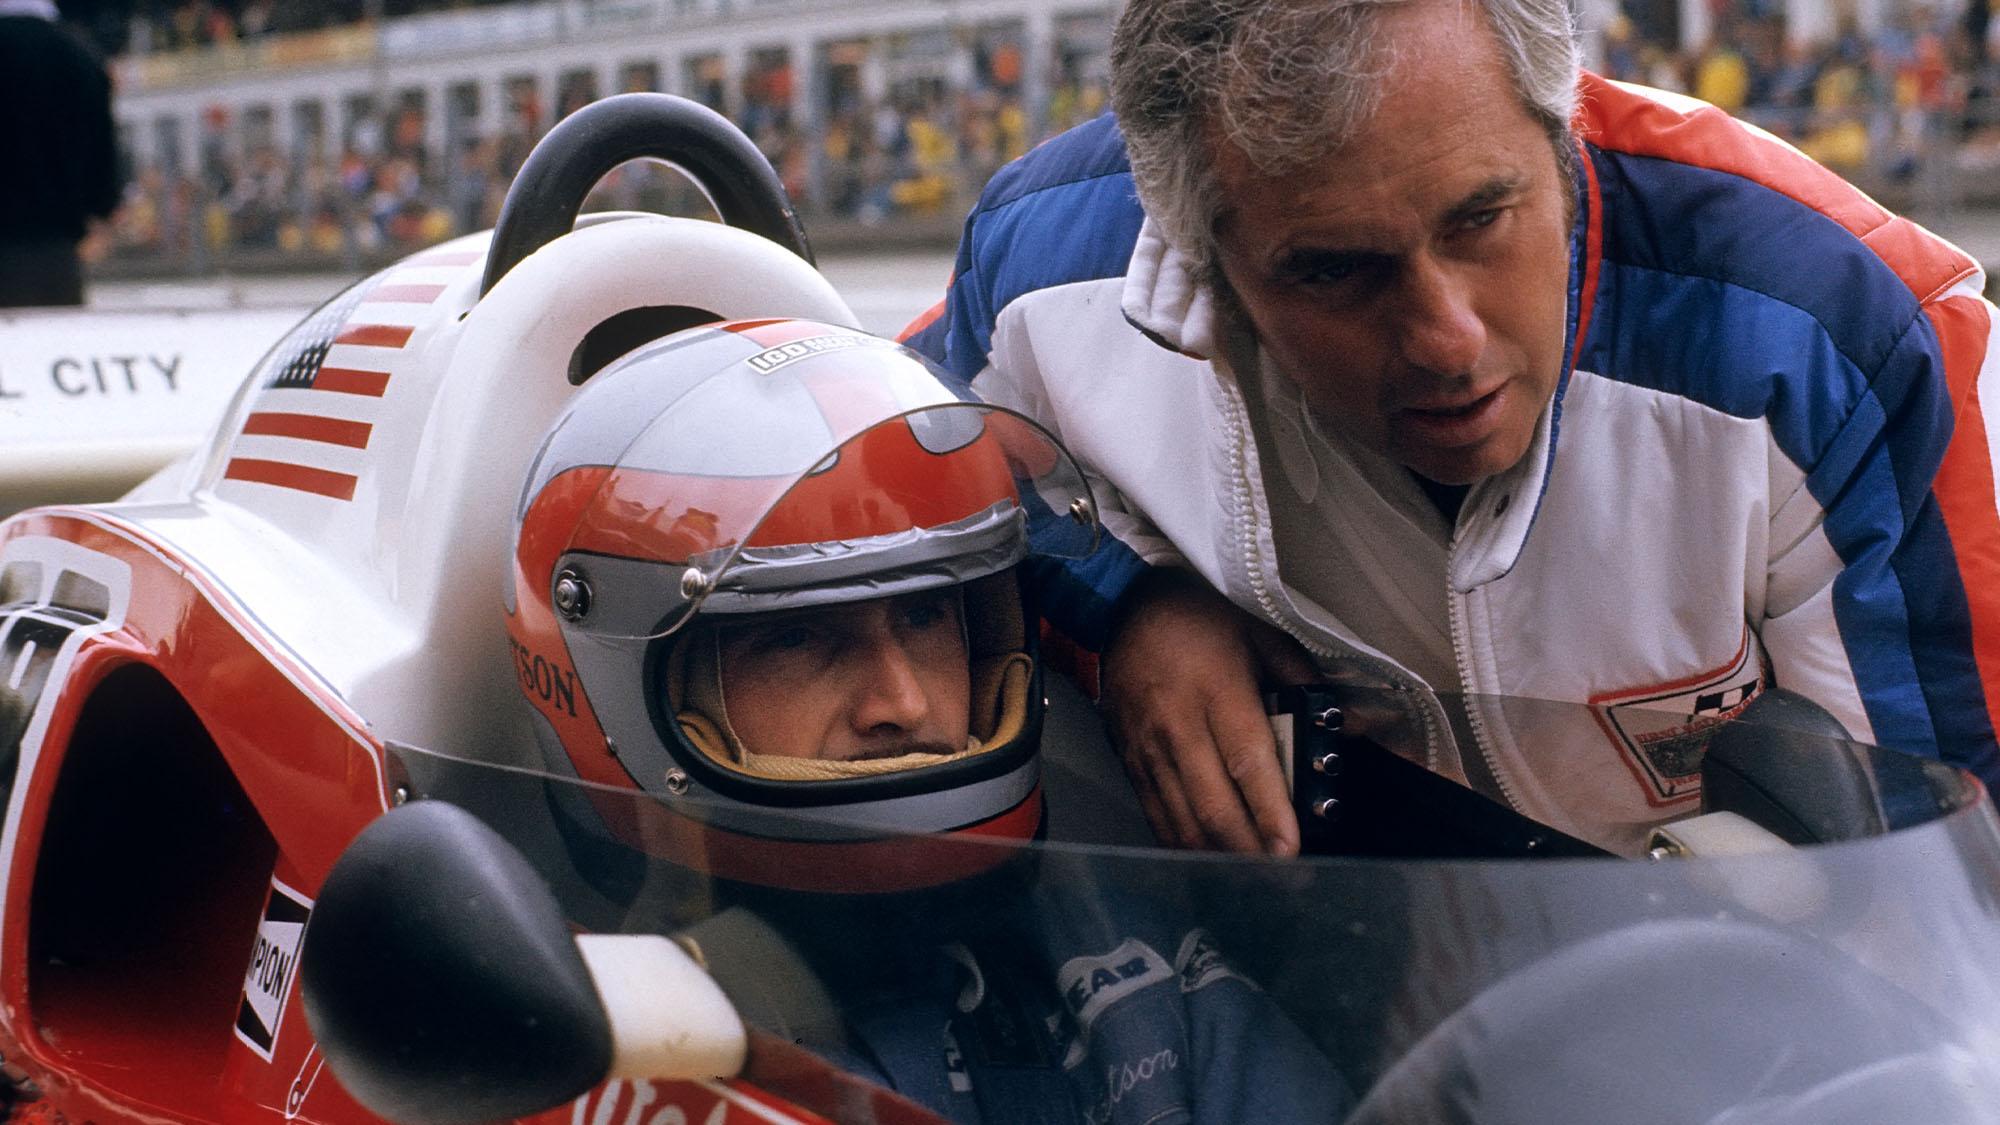 John Watson, Roger Penske, Penske-Ford PC4, Grand Prix of Germany, Nurburgring, 01 August 1976. John Watson with team owner Roger Penske. (Photo by Paul-Henri Cahier /Getty Images)